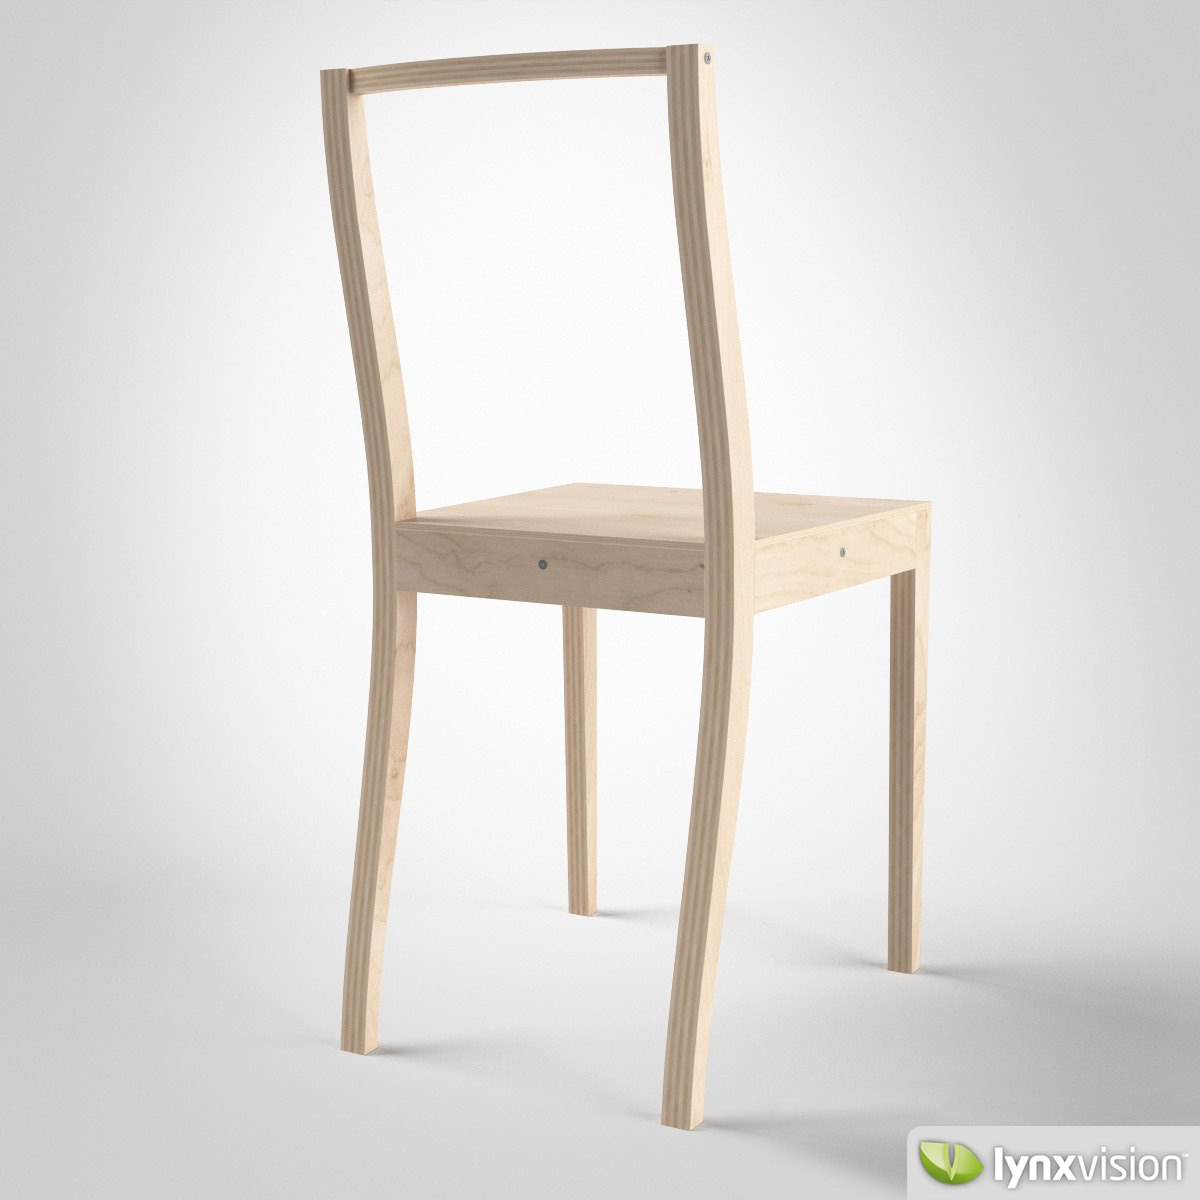 Ply chair jasper morrison for Plywood chair morrison